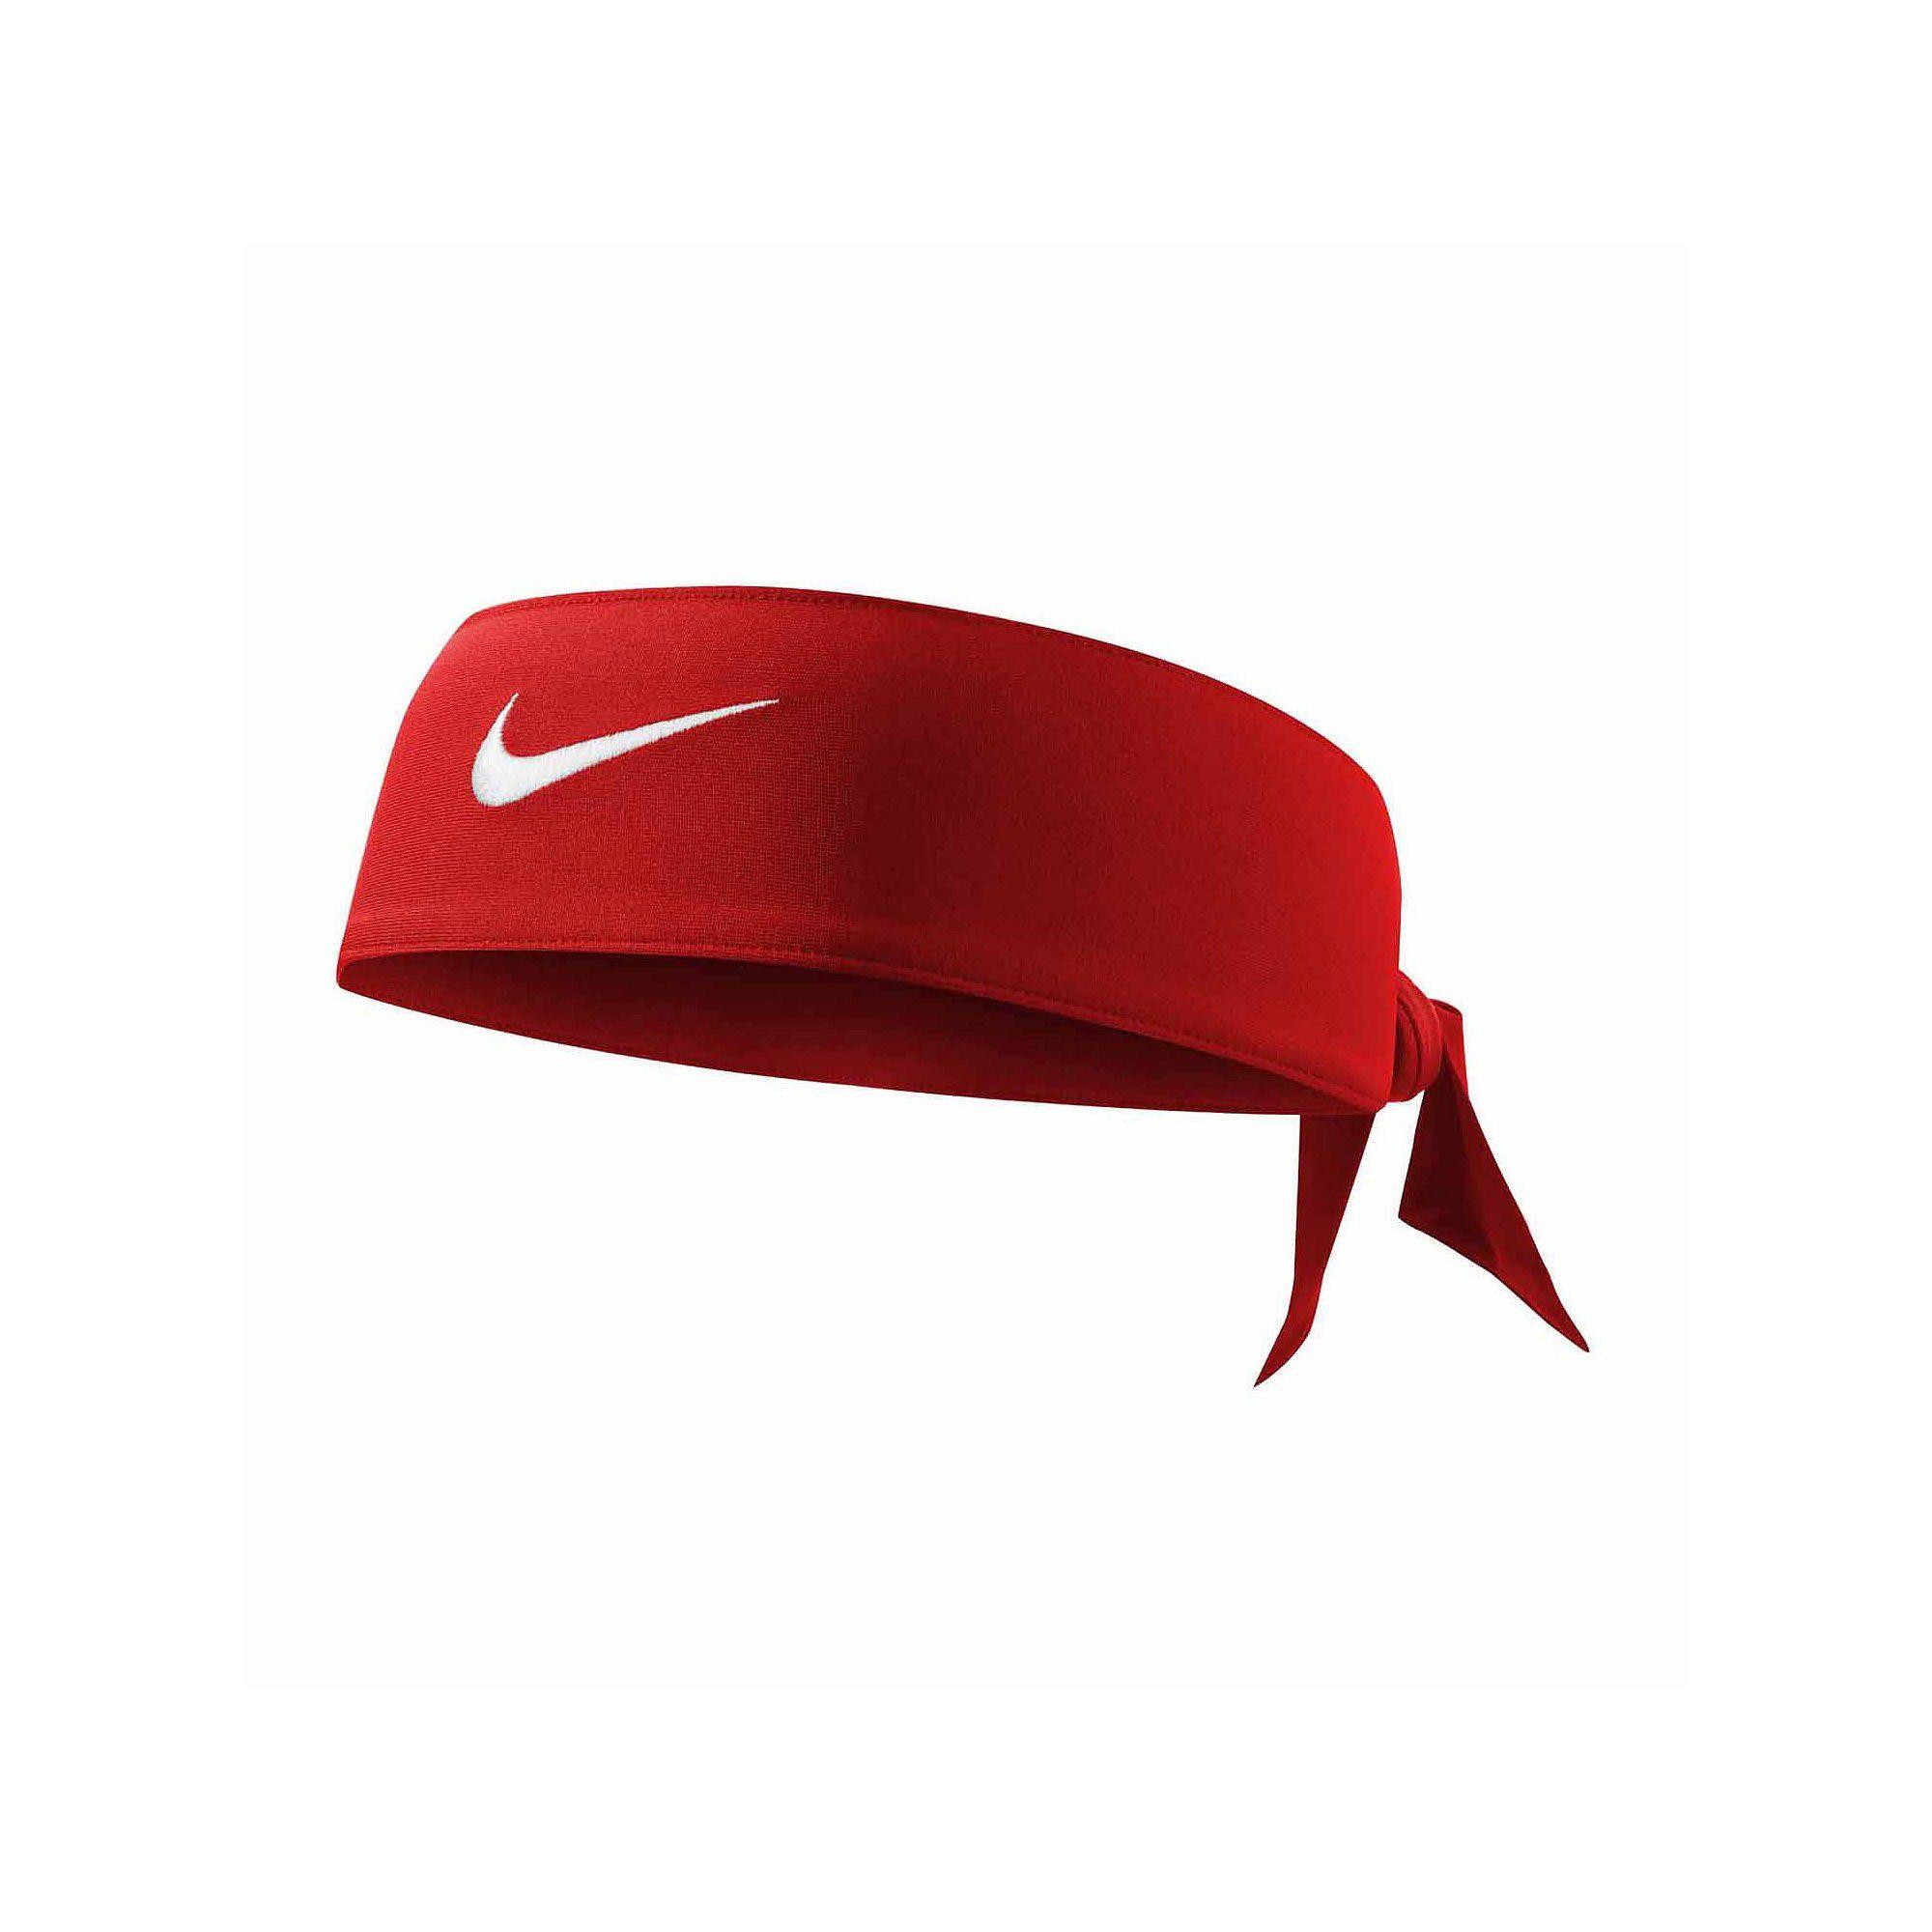 Bandana Nike Dry Fit Head Tie - Vermelho  - REAL ESPORTE